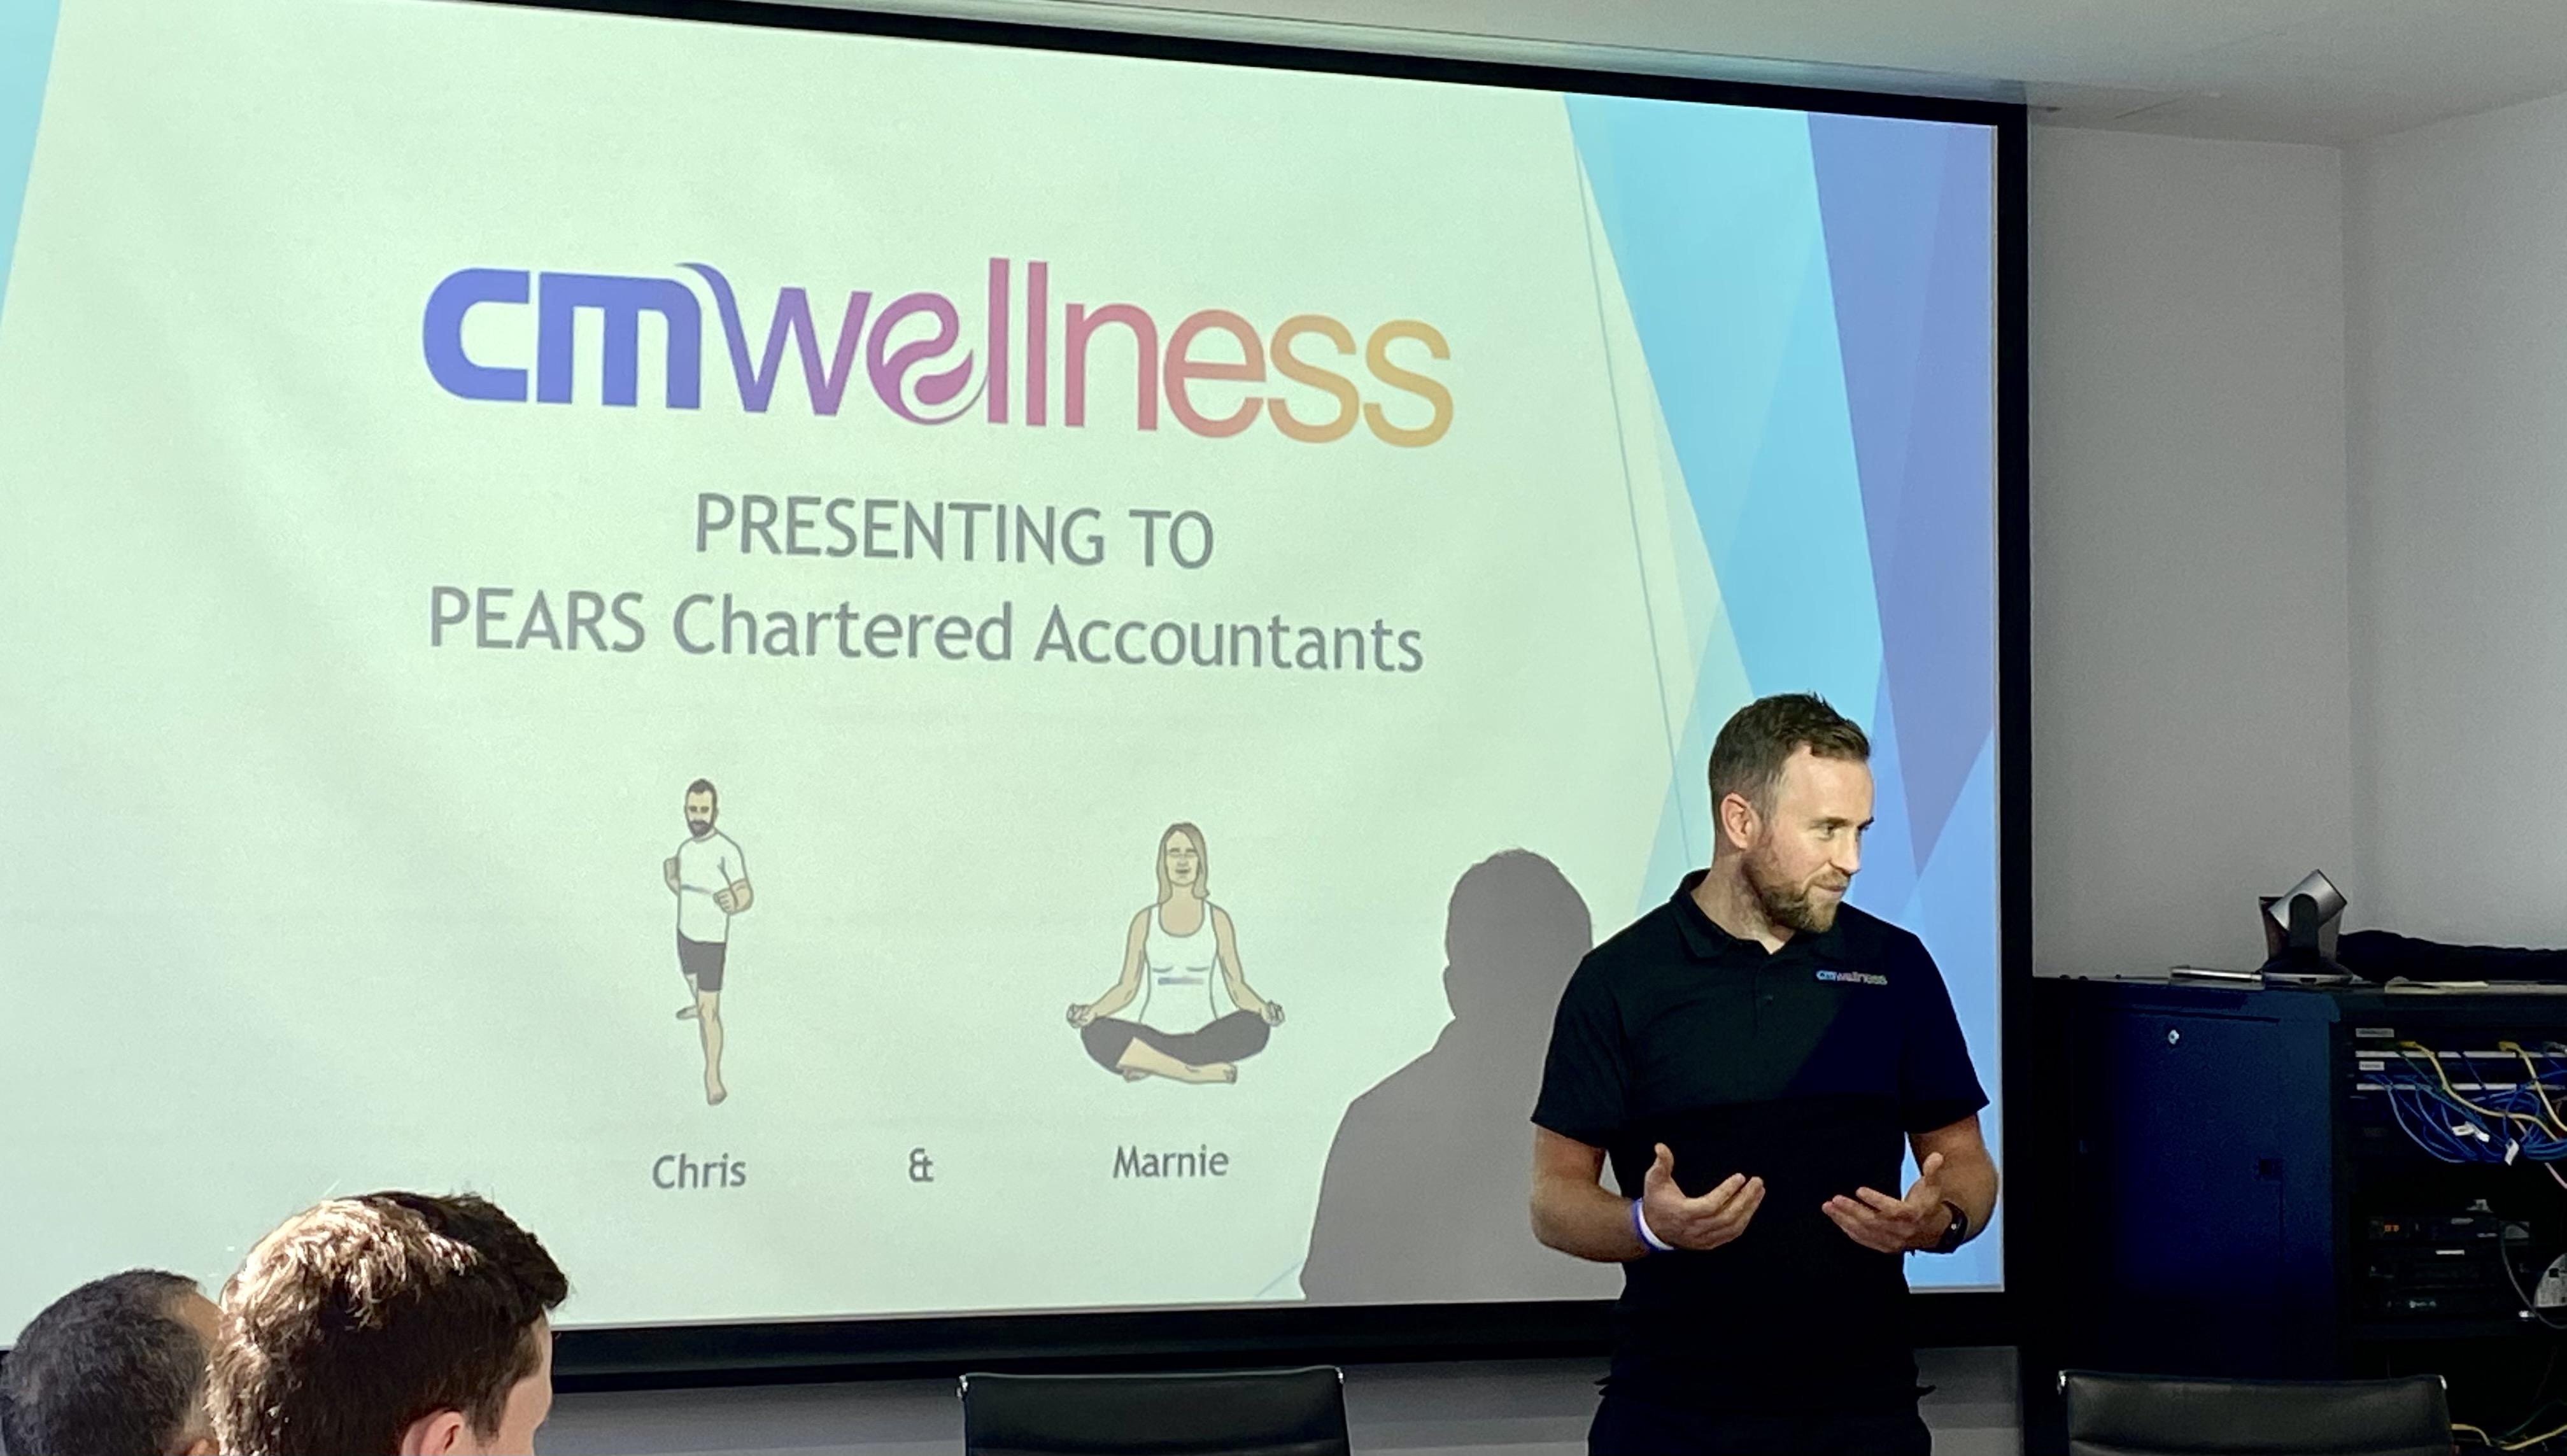 CM Wellness Presentations